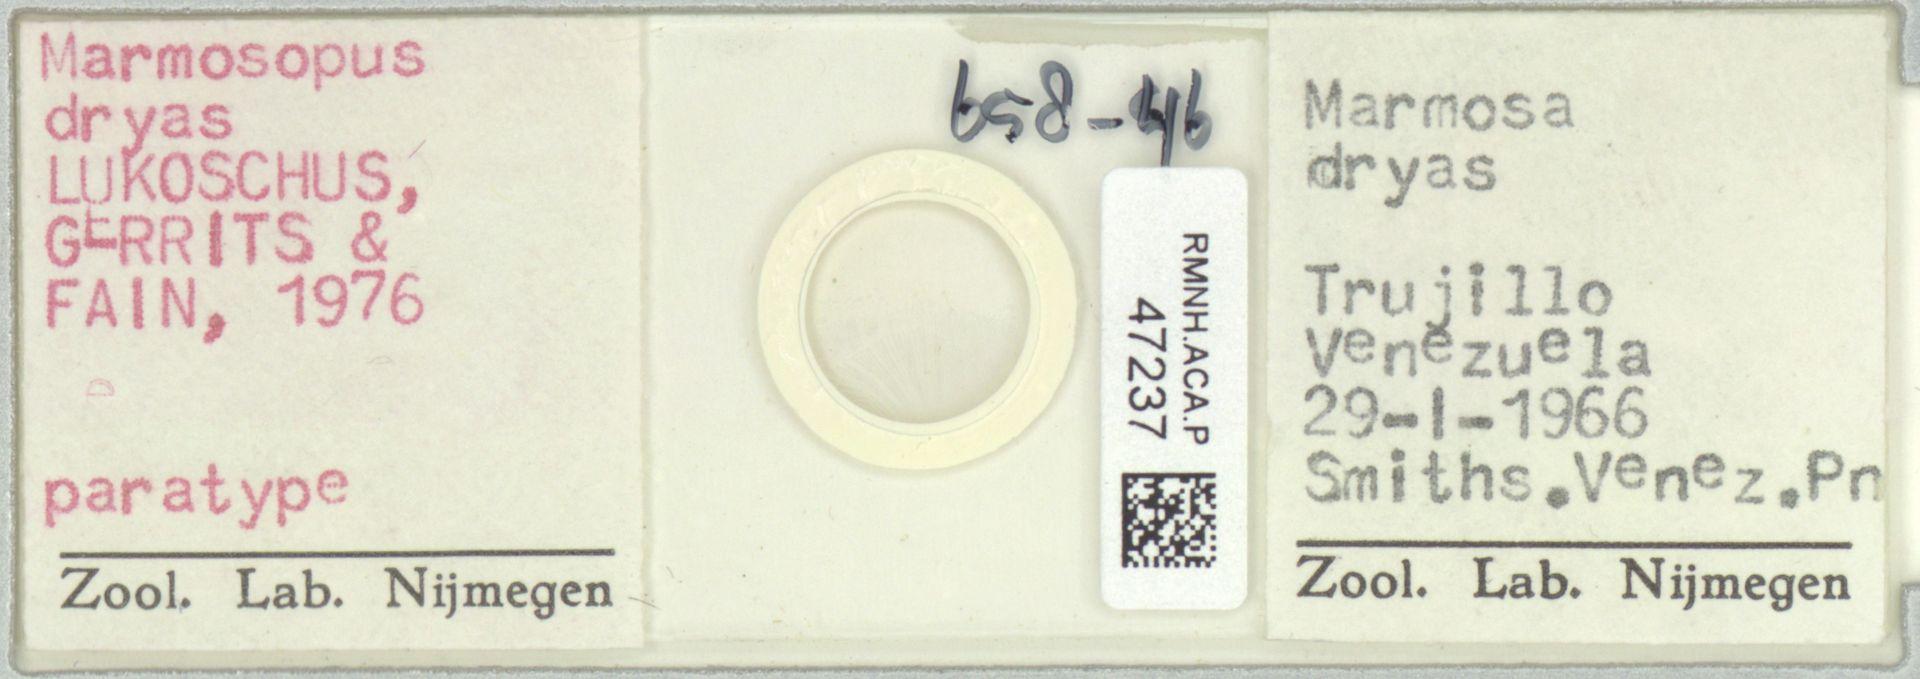 RMNH.ACA.P.47237 | Marmosopus dryas Lukoschus, Gerrits & Fain, 1976